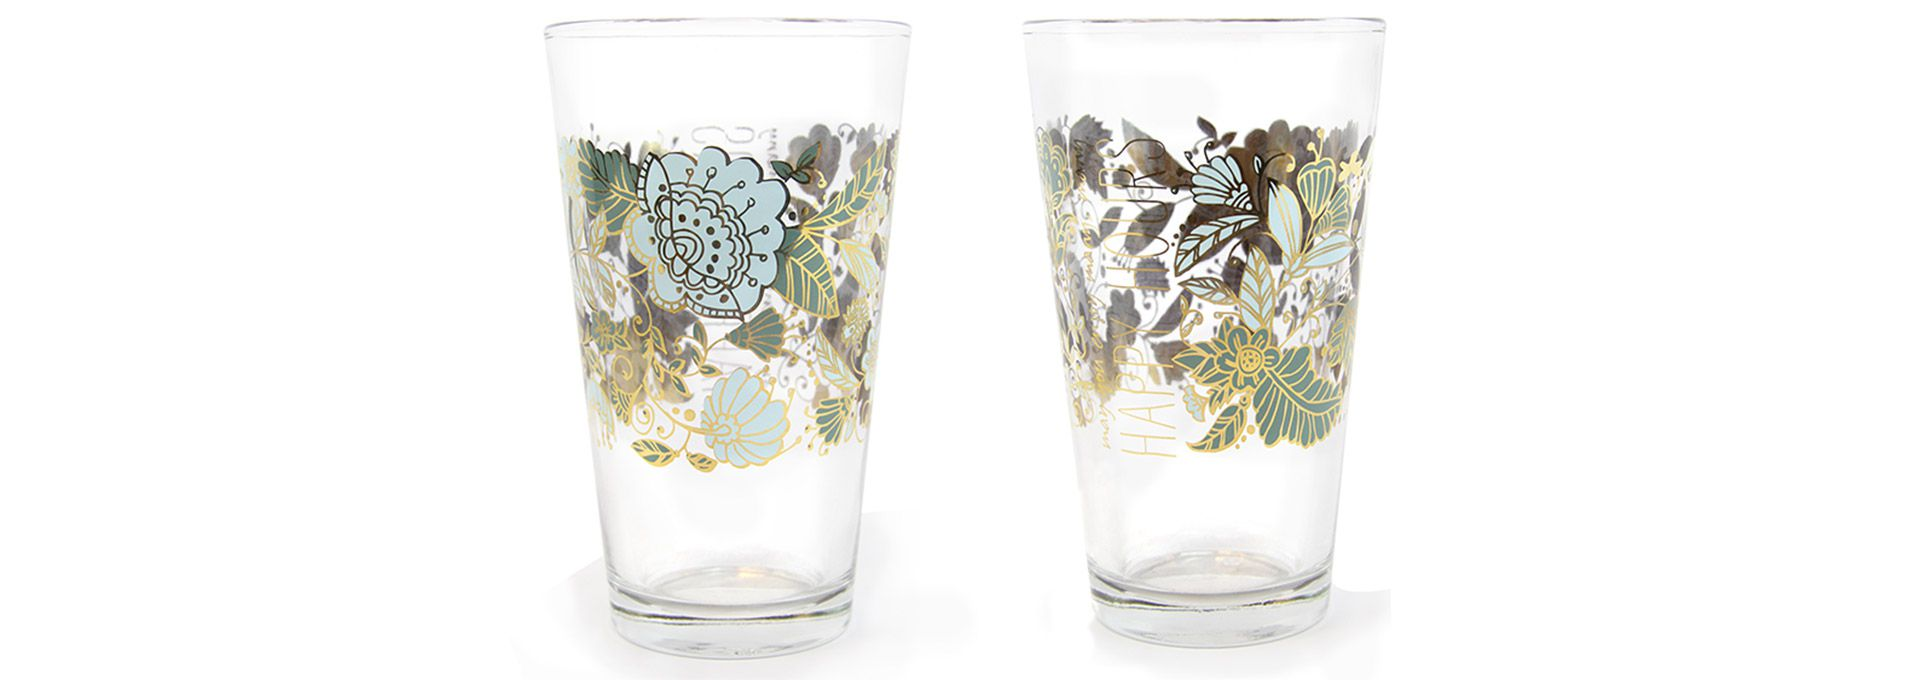 Custom designed promotional glasses glassware seattle